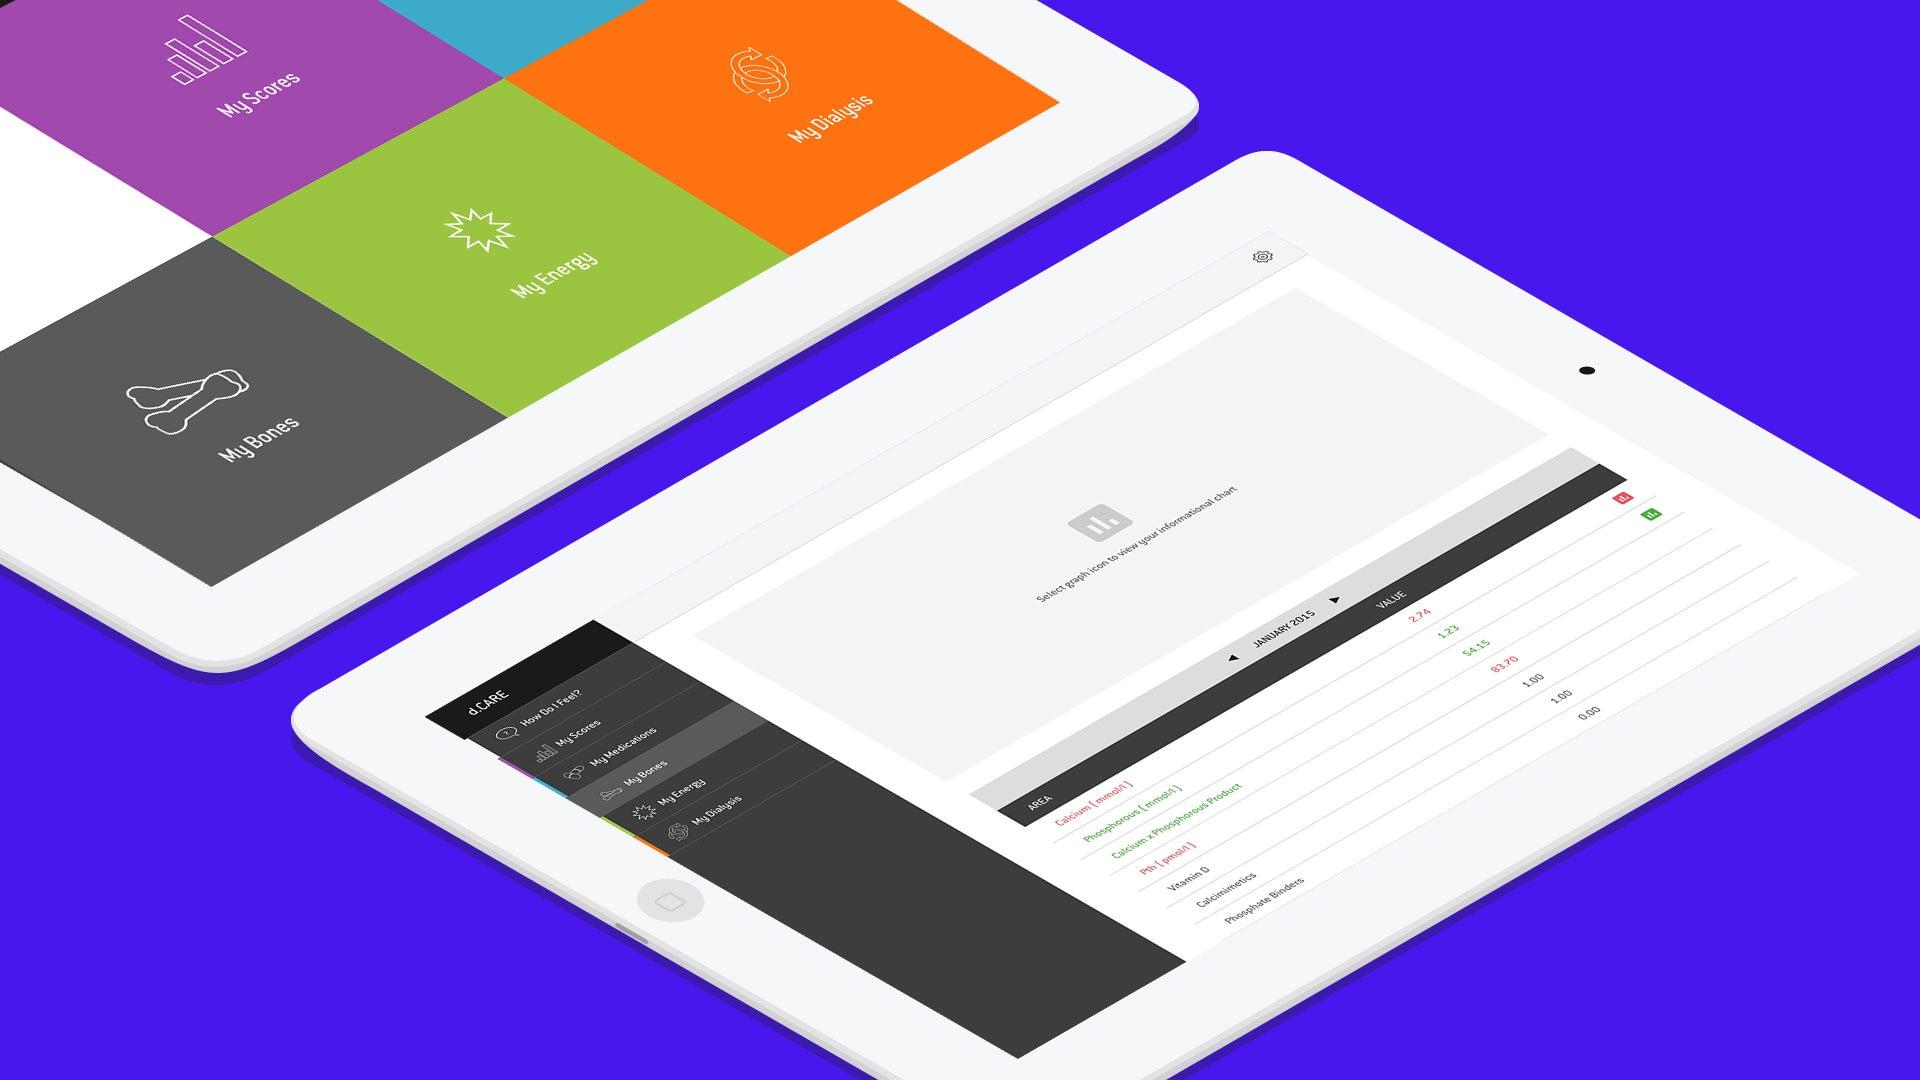 Diaverum app - My stats screen